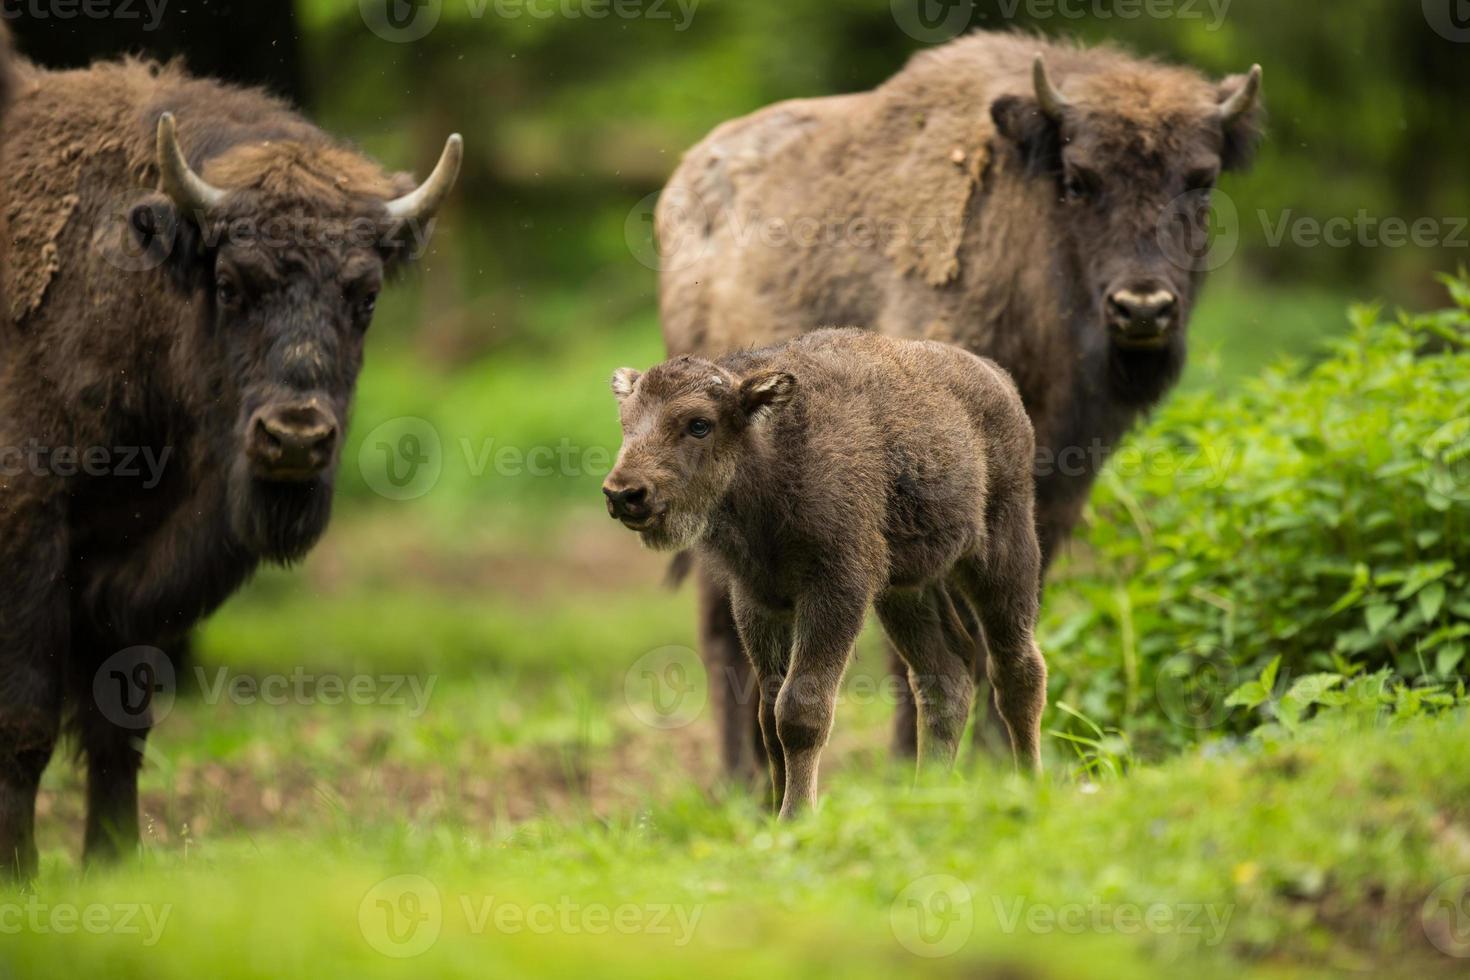 European bison (Bison bonasus) photo